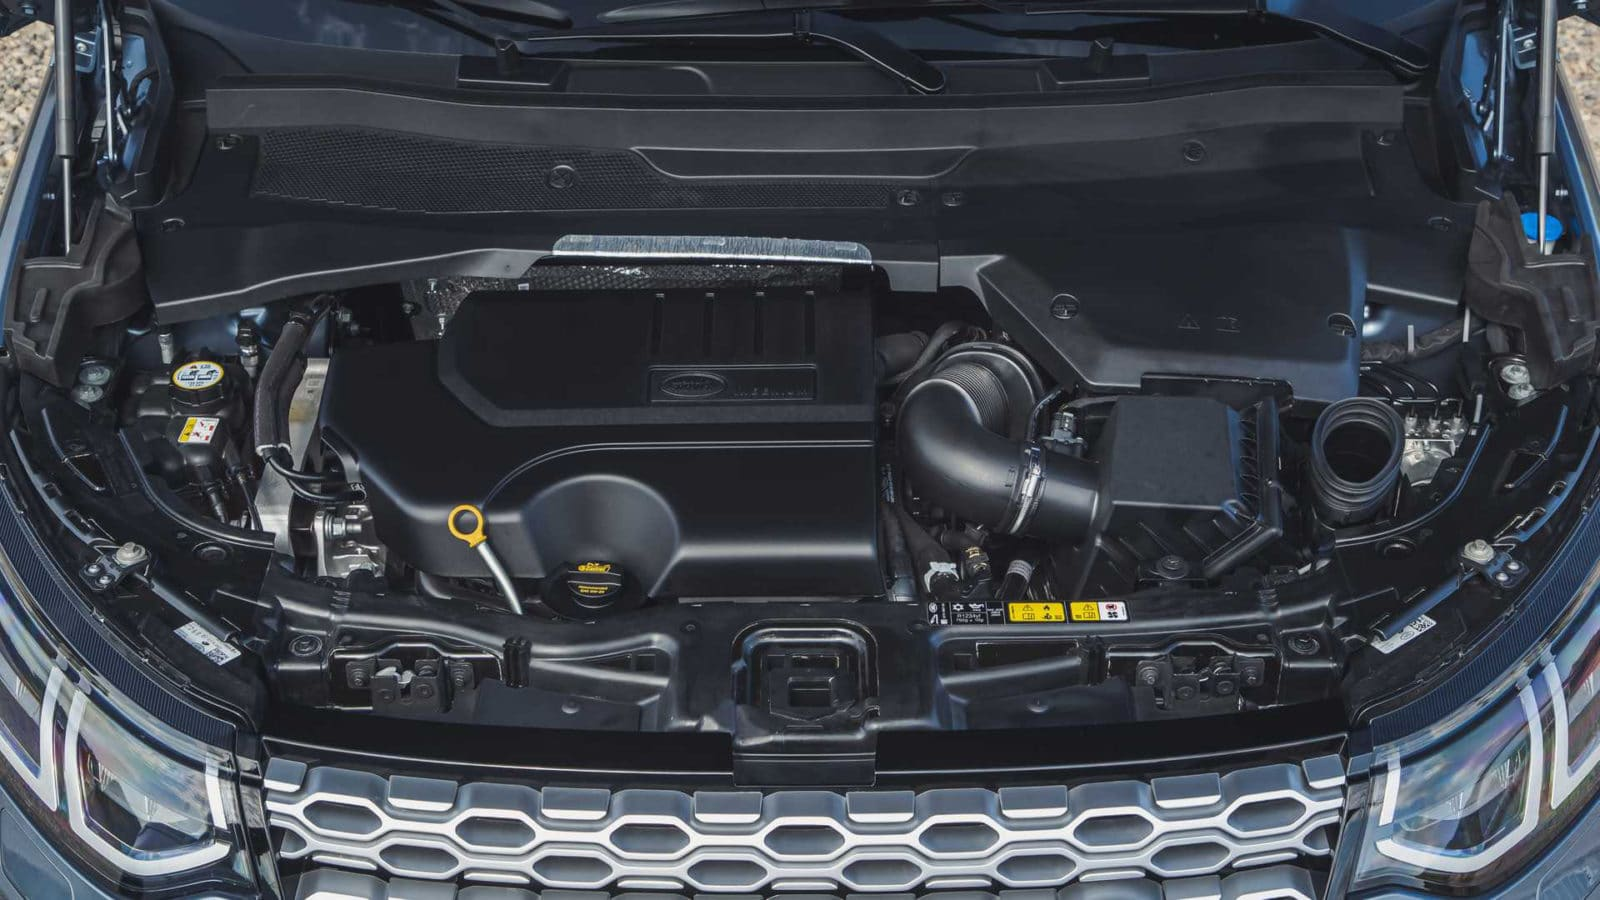 Ленд Ровер Дискавери Спорт 2020: фото, технические характеристики, цена, двигатель, мотор, силовая установка